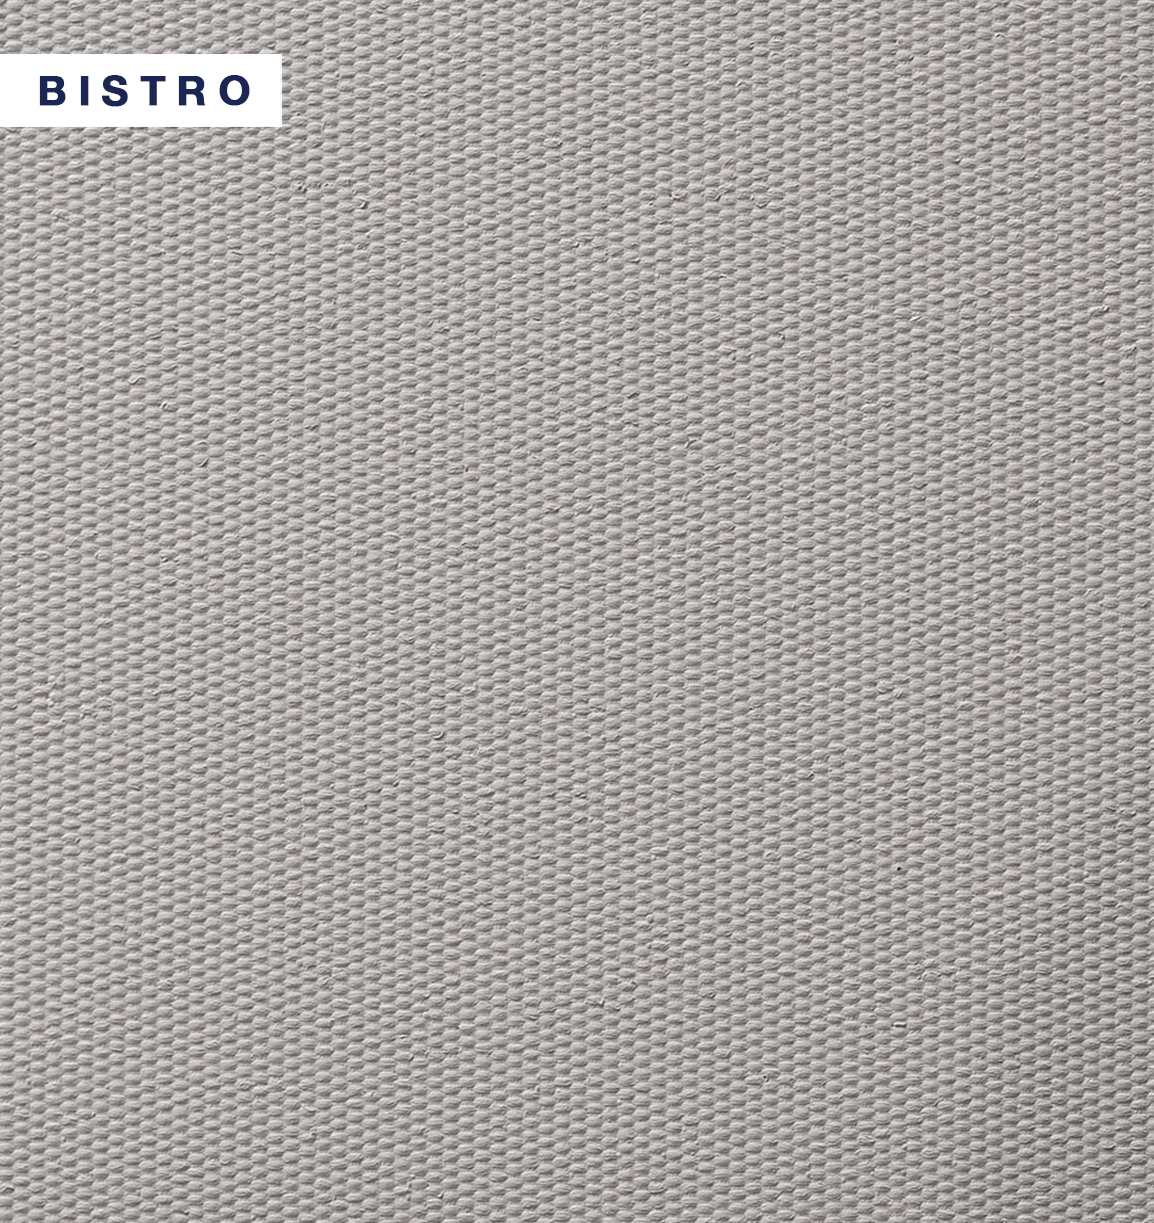 VIBE - Bistro.jpg